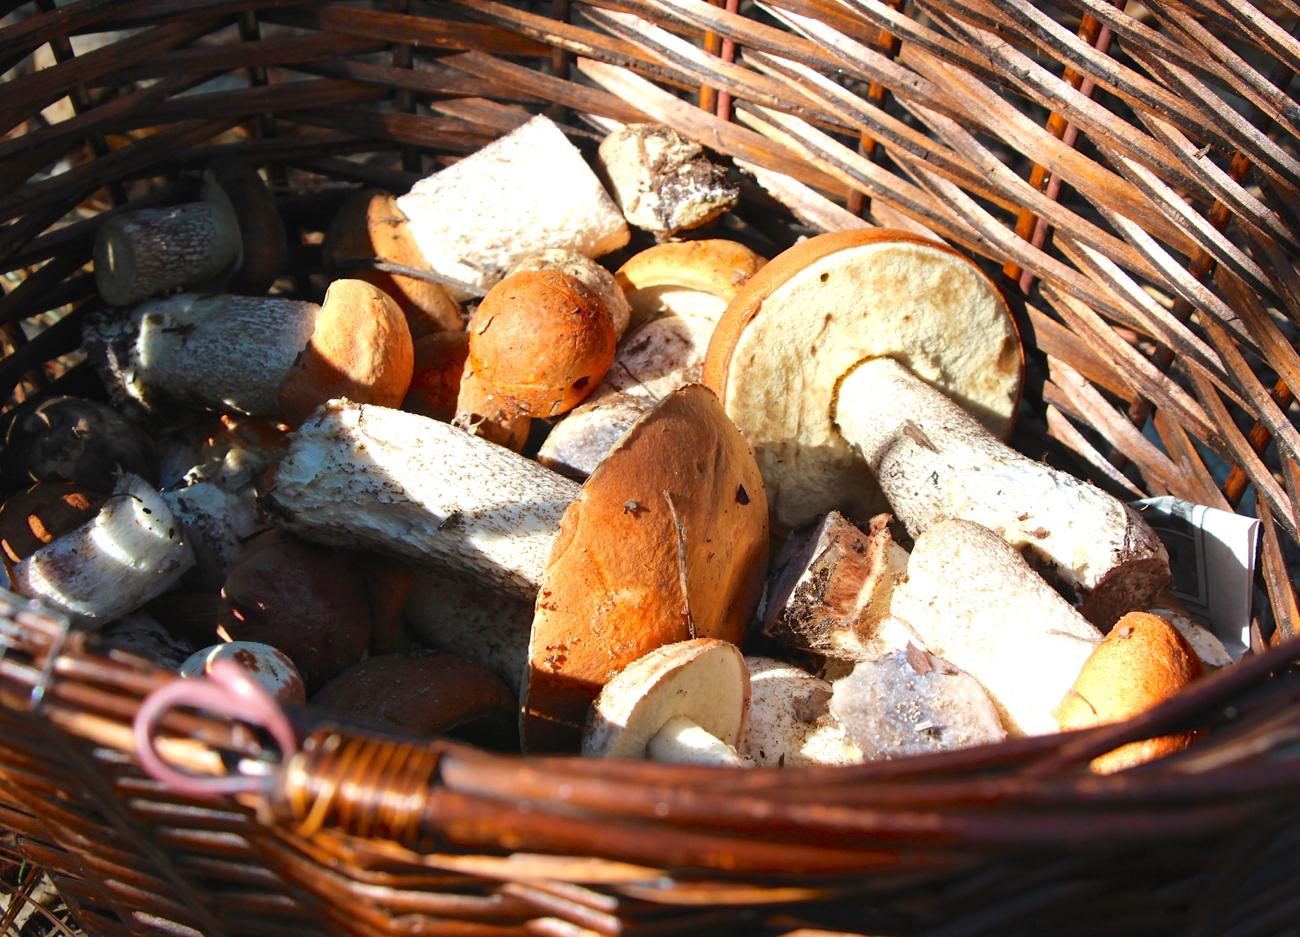 mushrooms, the hills